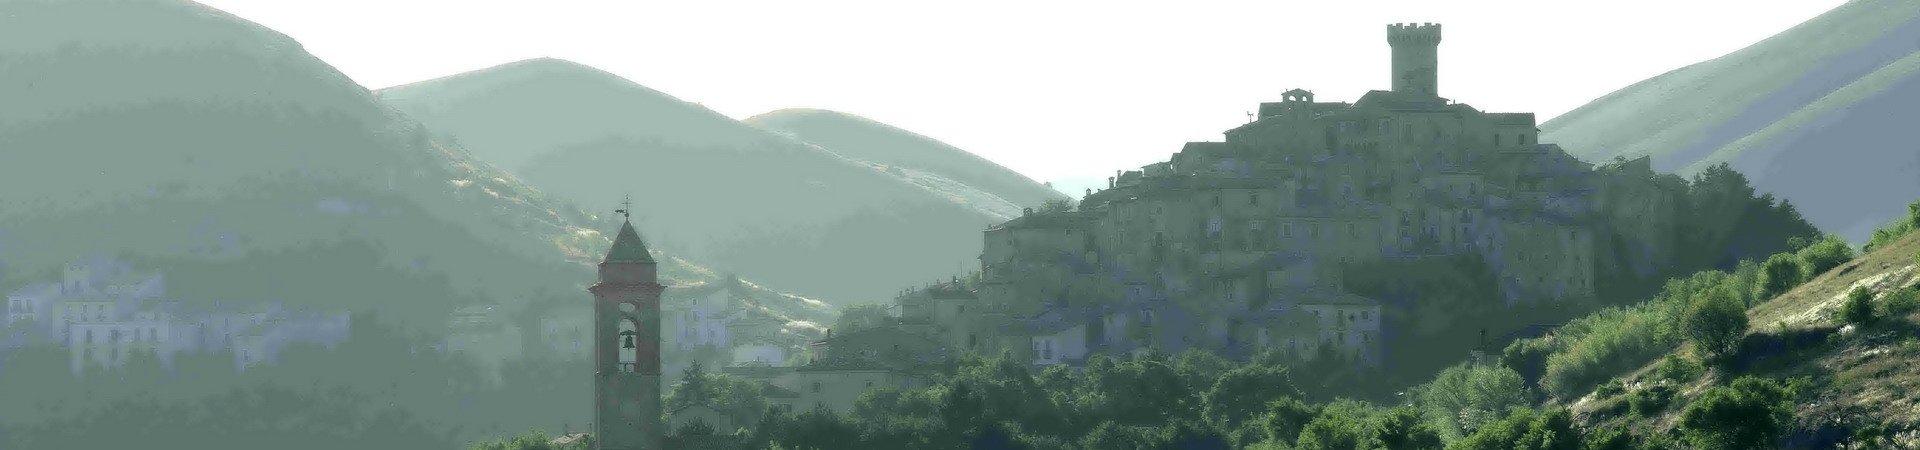 Vakantie Abruzzen